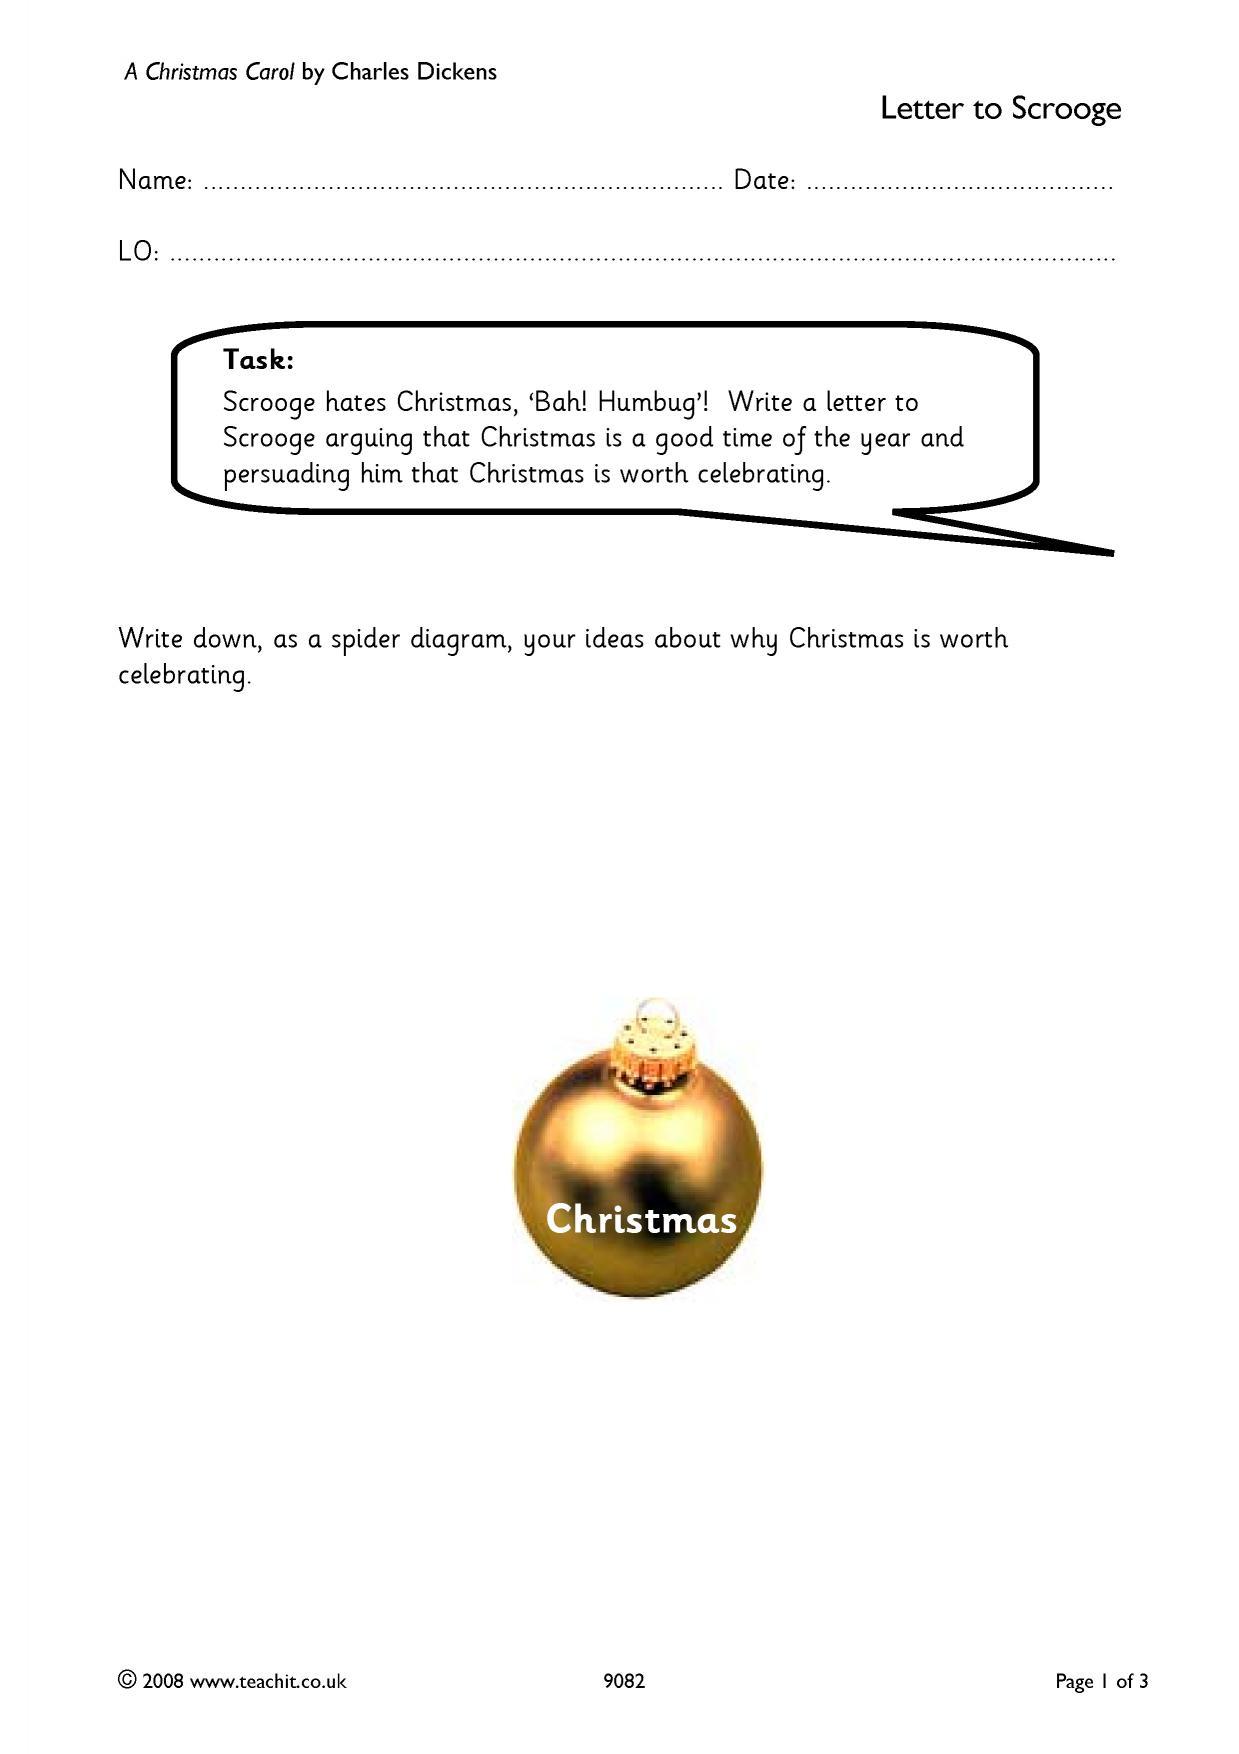 Homework help with a christmas carol